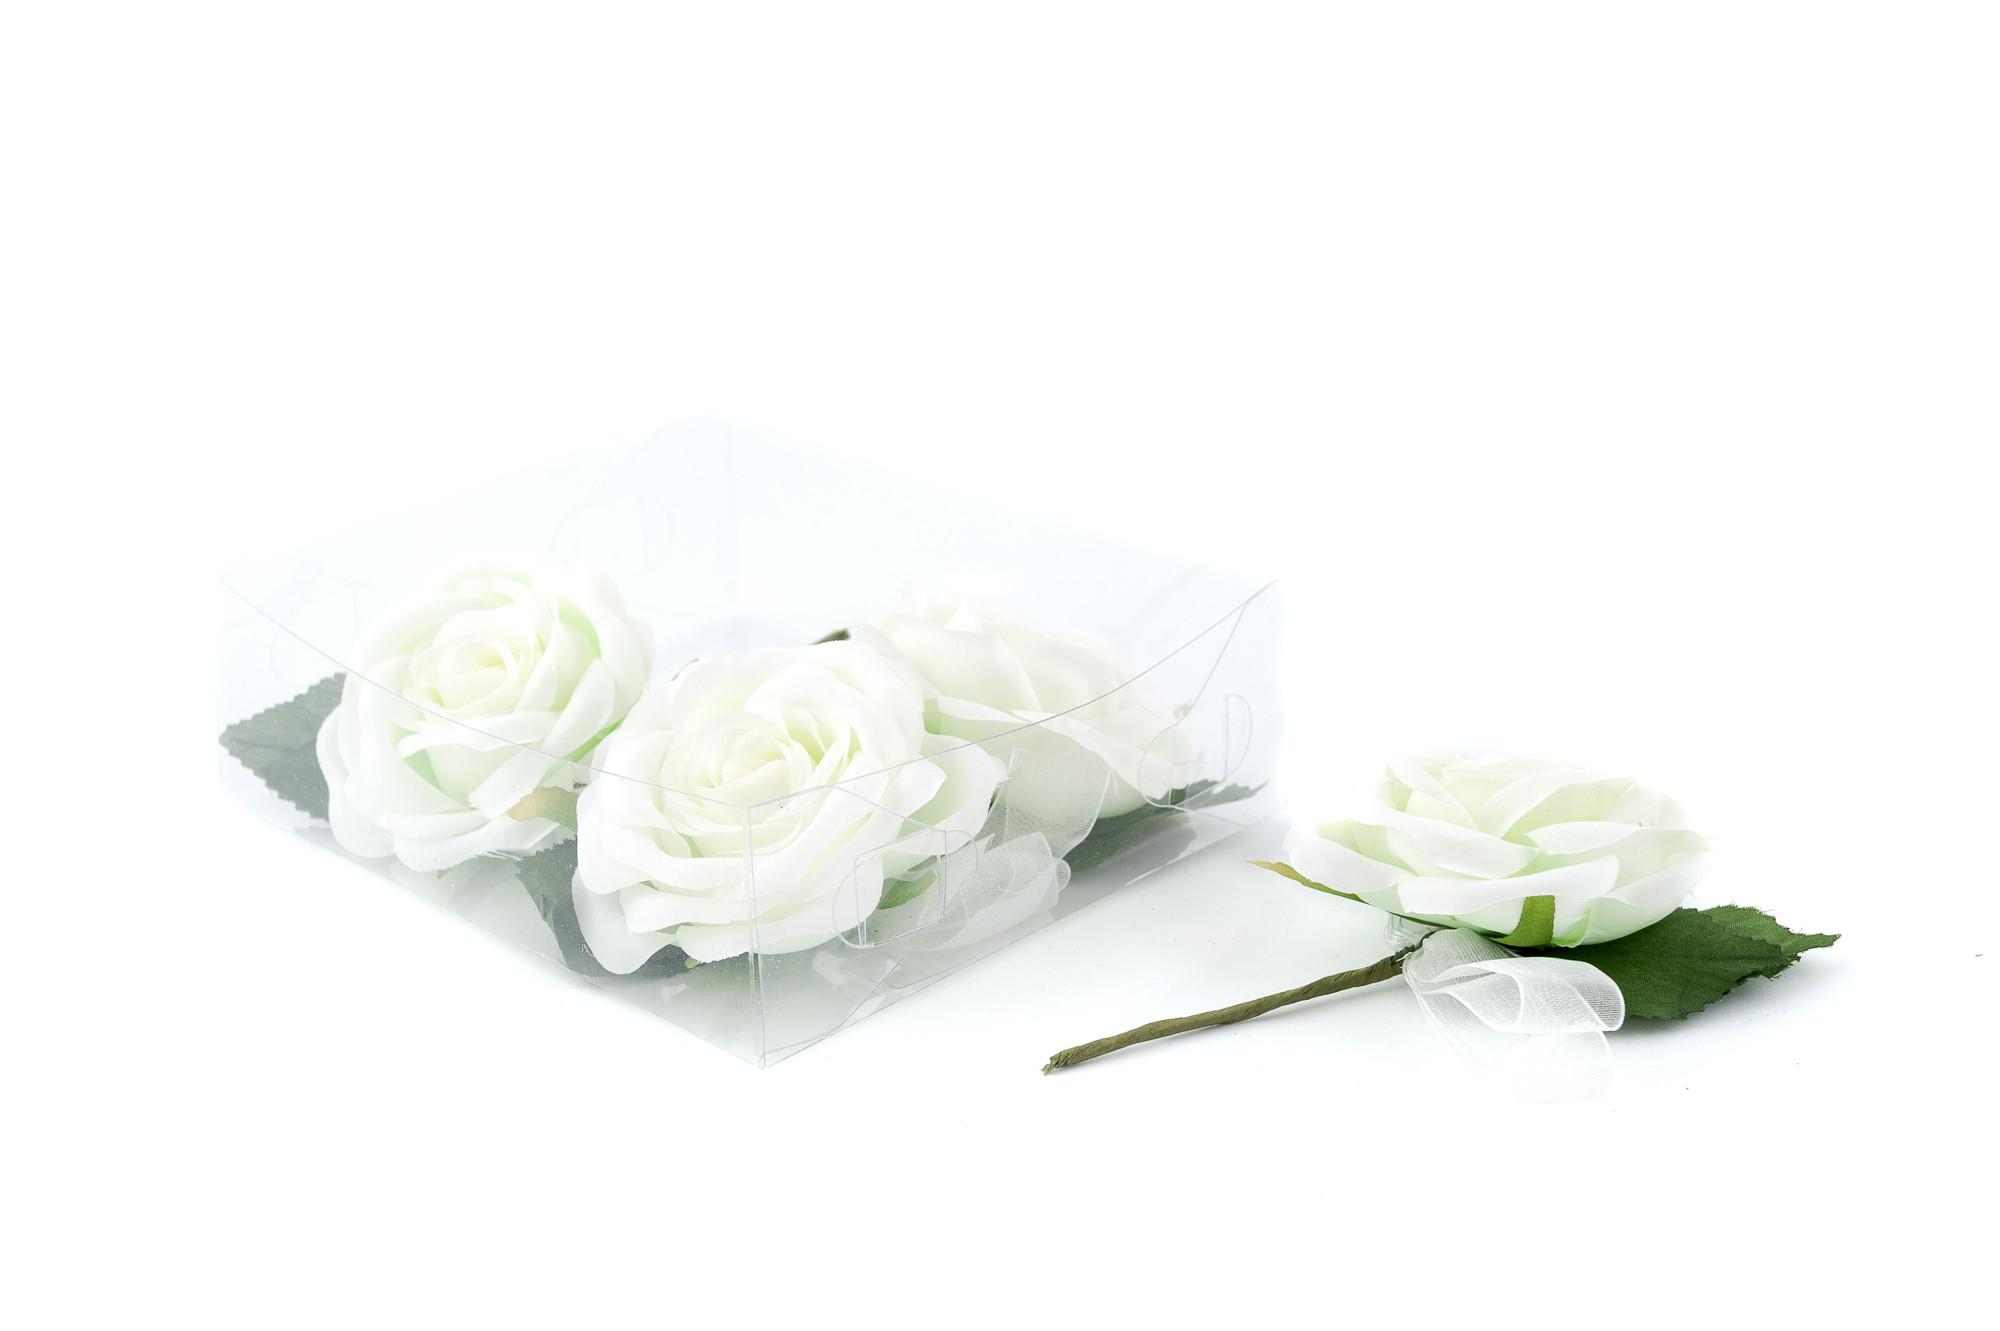 Růže 6 cm, 4 ks